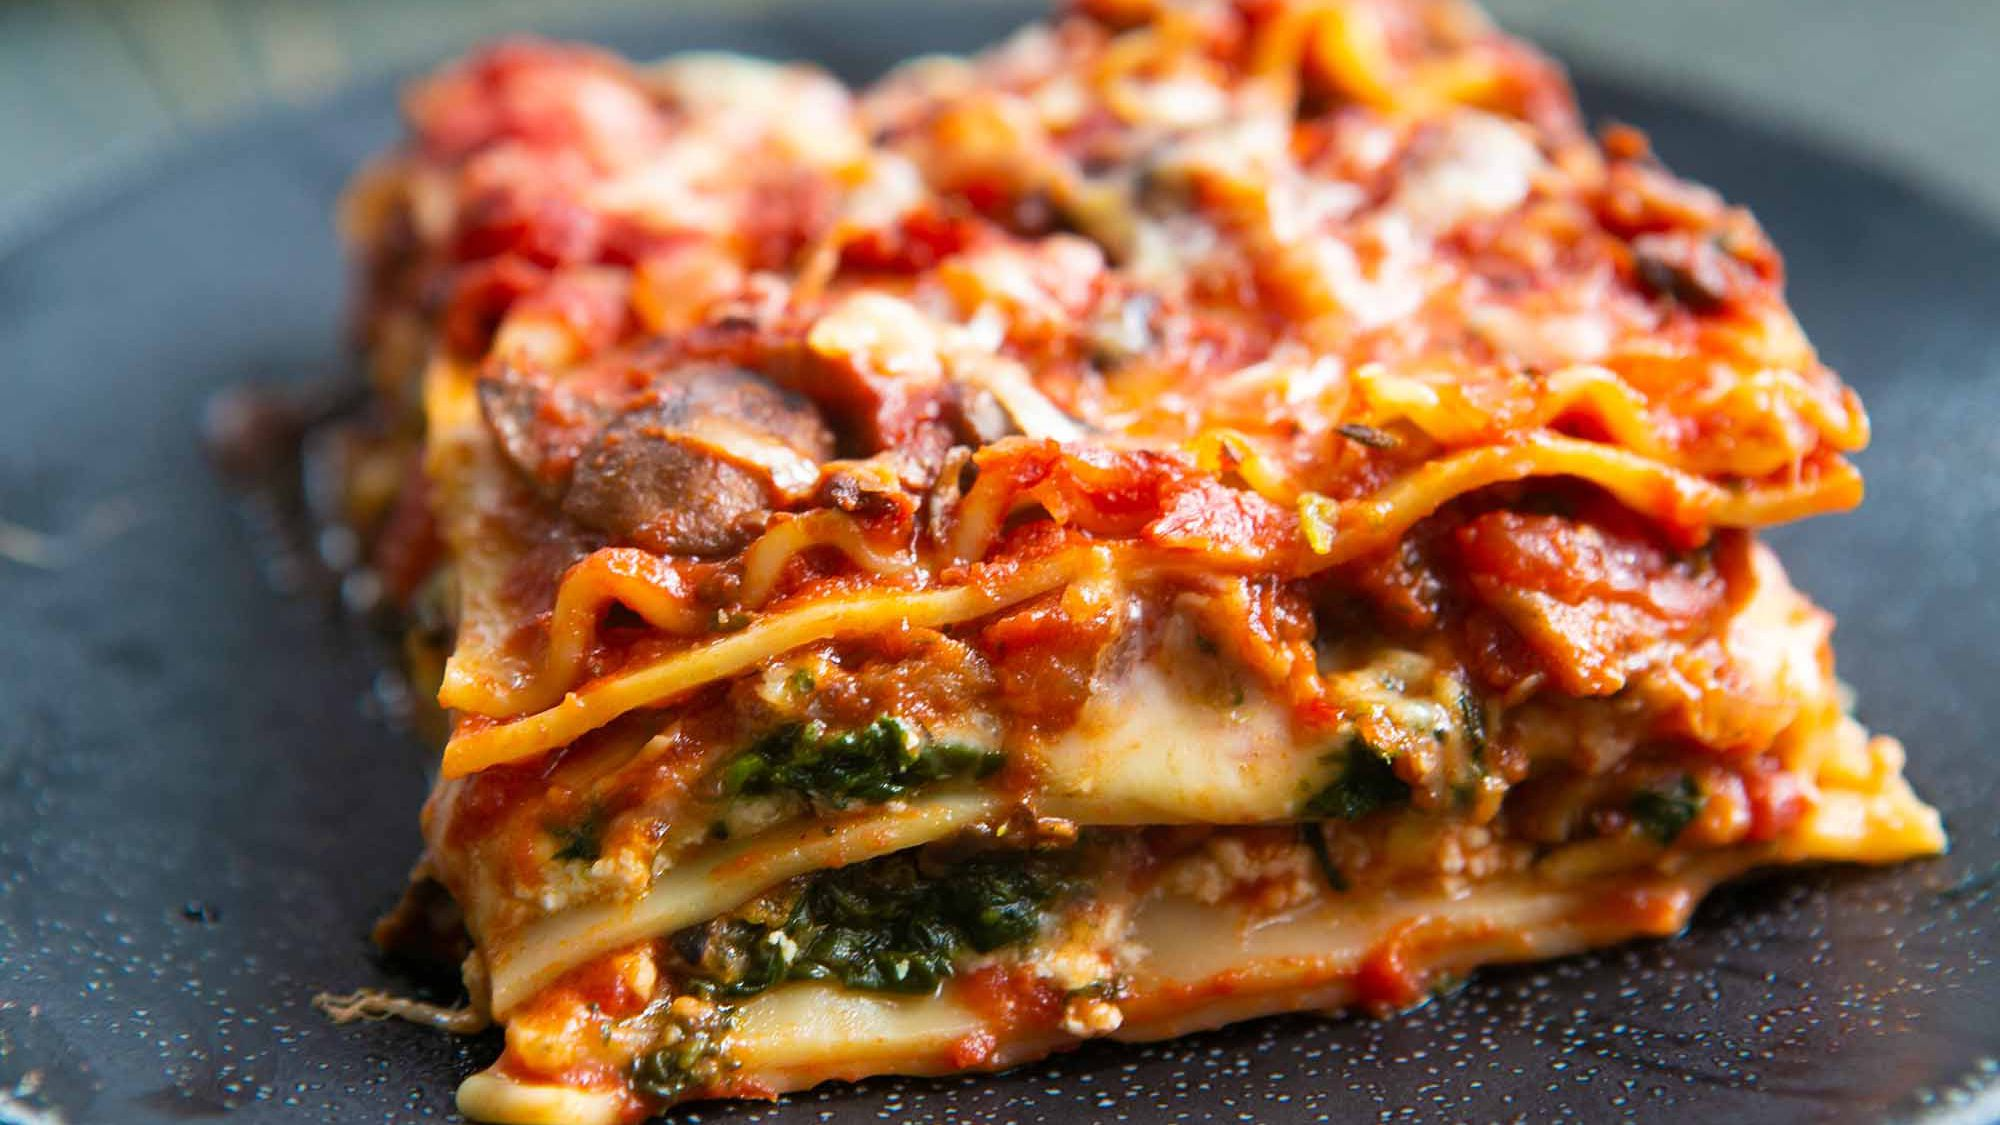 Vegetarian Spinach and Mushroom Lasagna